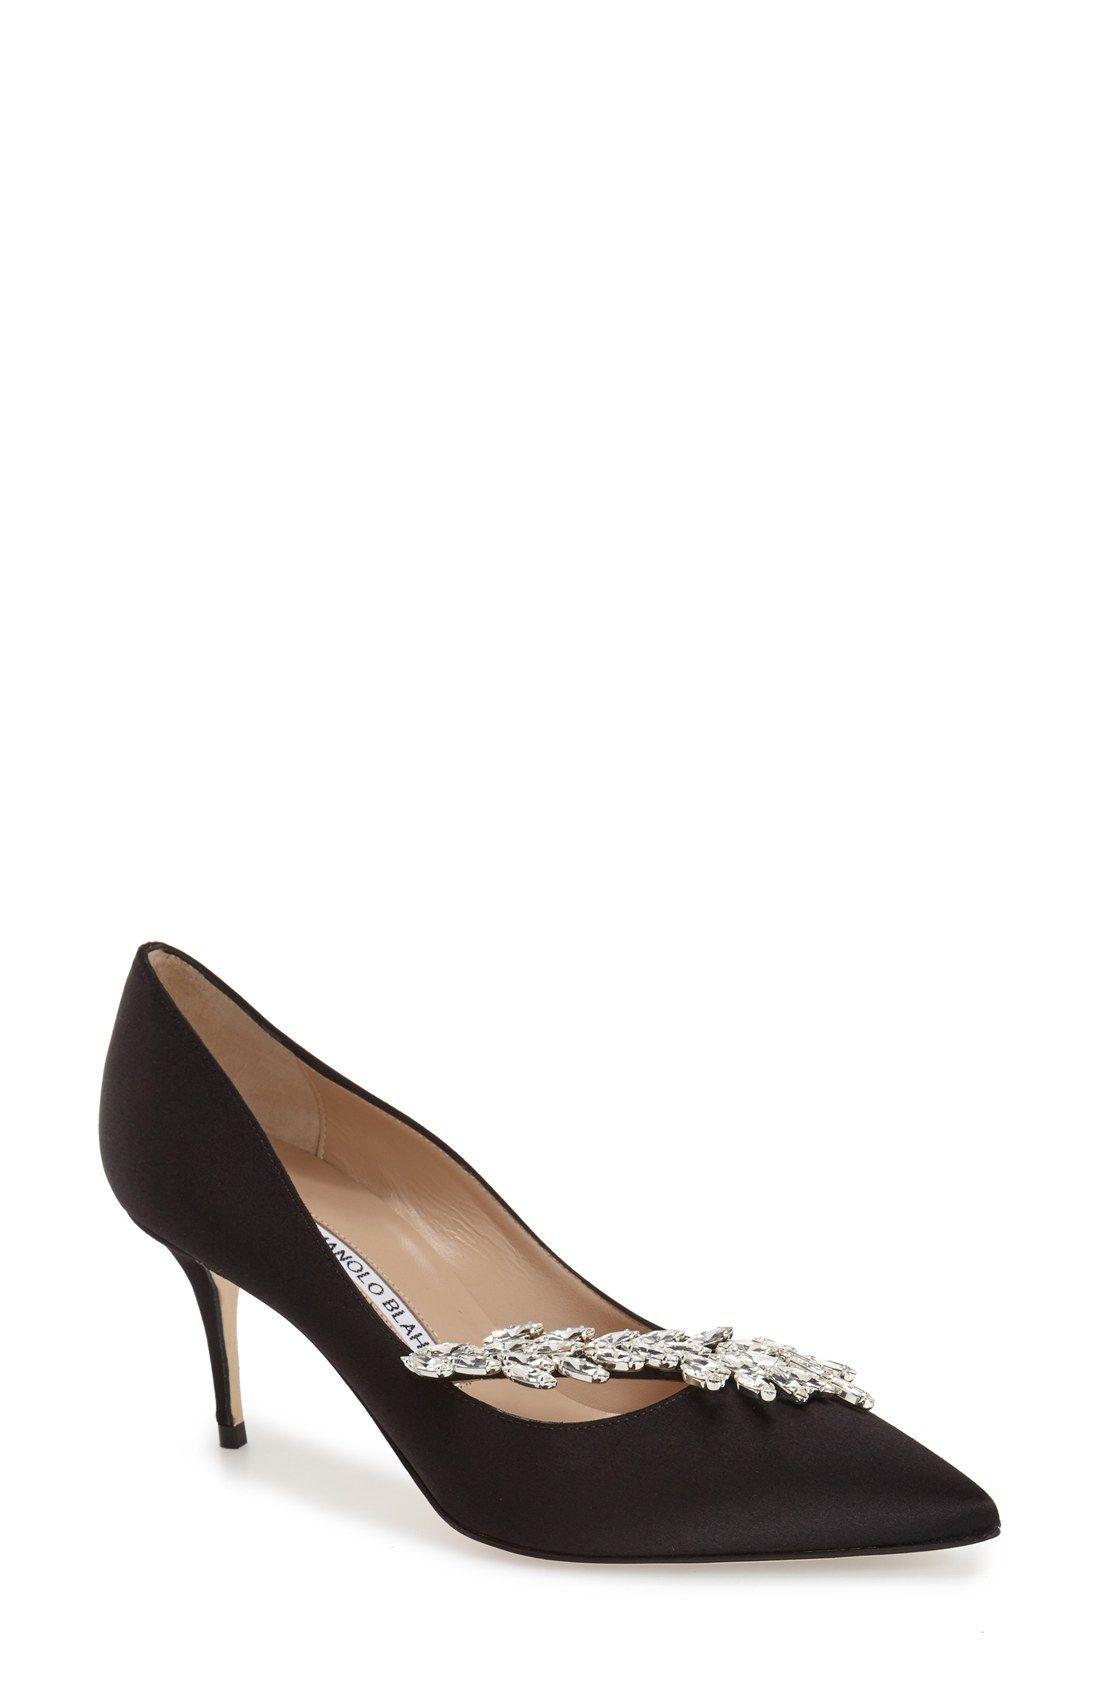 901301caa5bf Manolo Blahnik  Nadira  Crystal Embellished Pointy Toe Pump (Women)   ManoloblahnikHeels